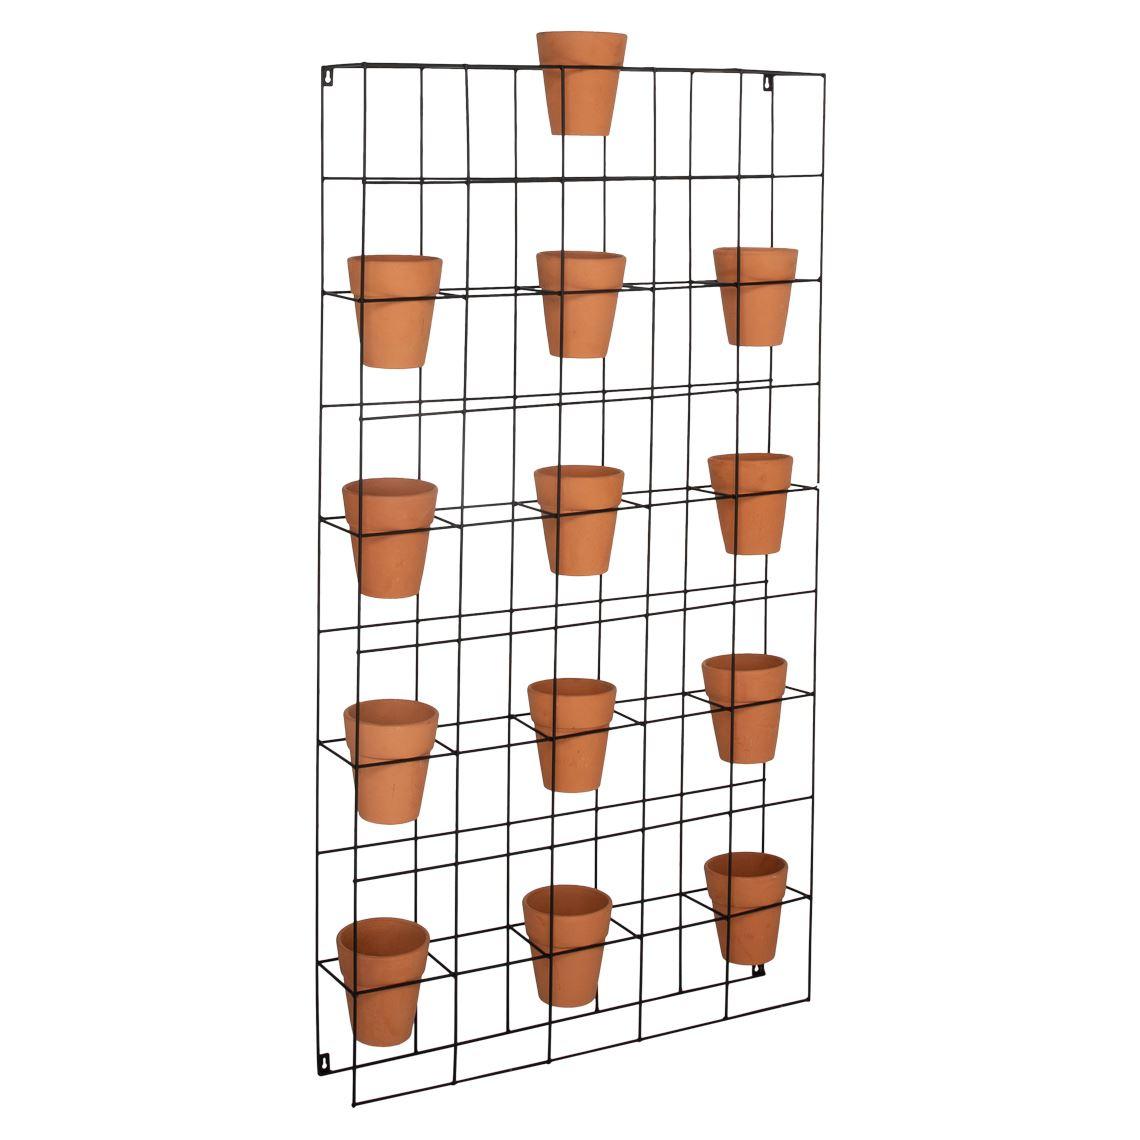 Roseum Wall Planter Size W 83cm x D 15cm x H 153cm in Black Iron/Ceramic Freedom